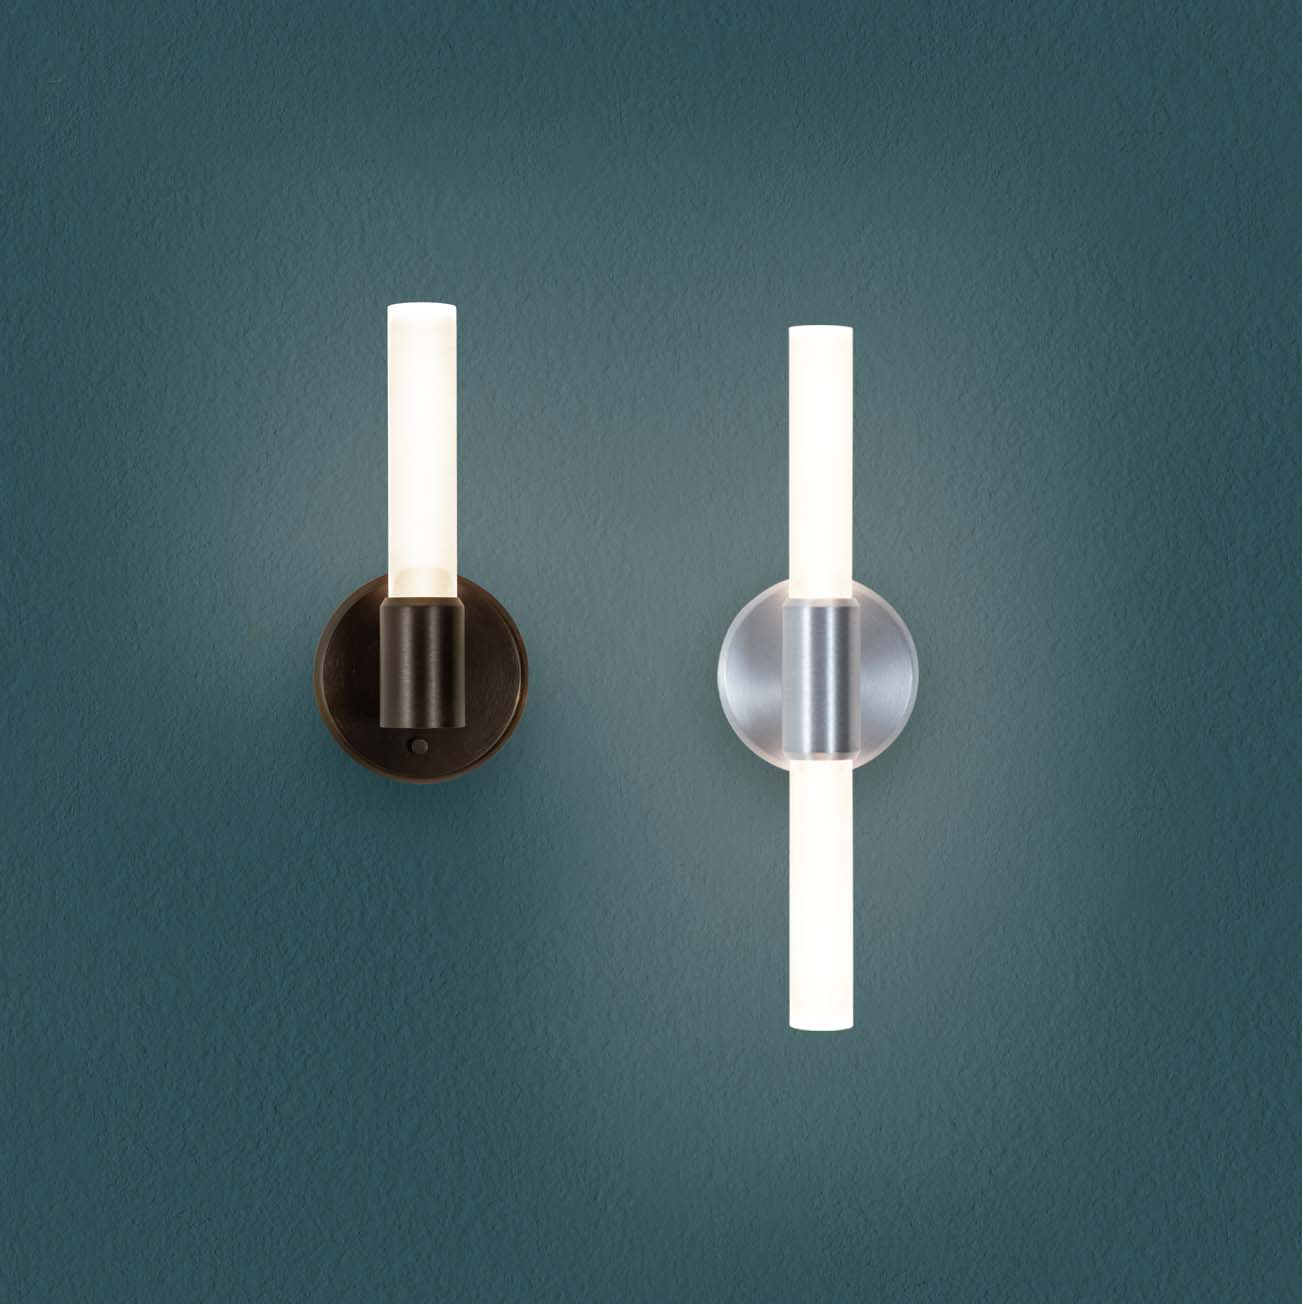 Theo candelabra style rod sconces